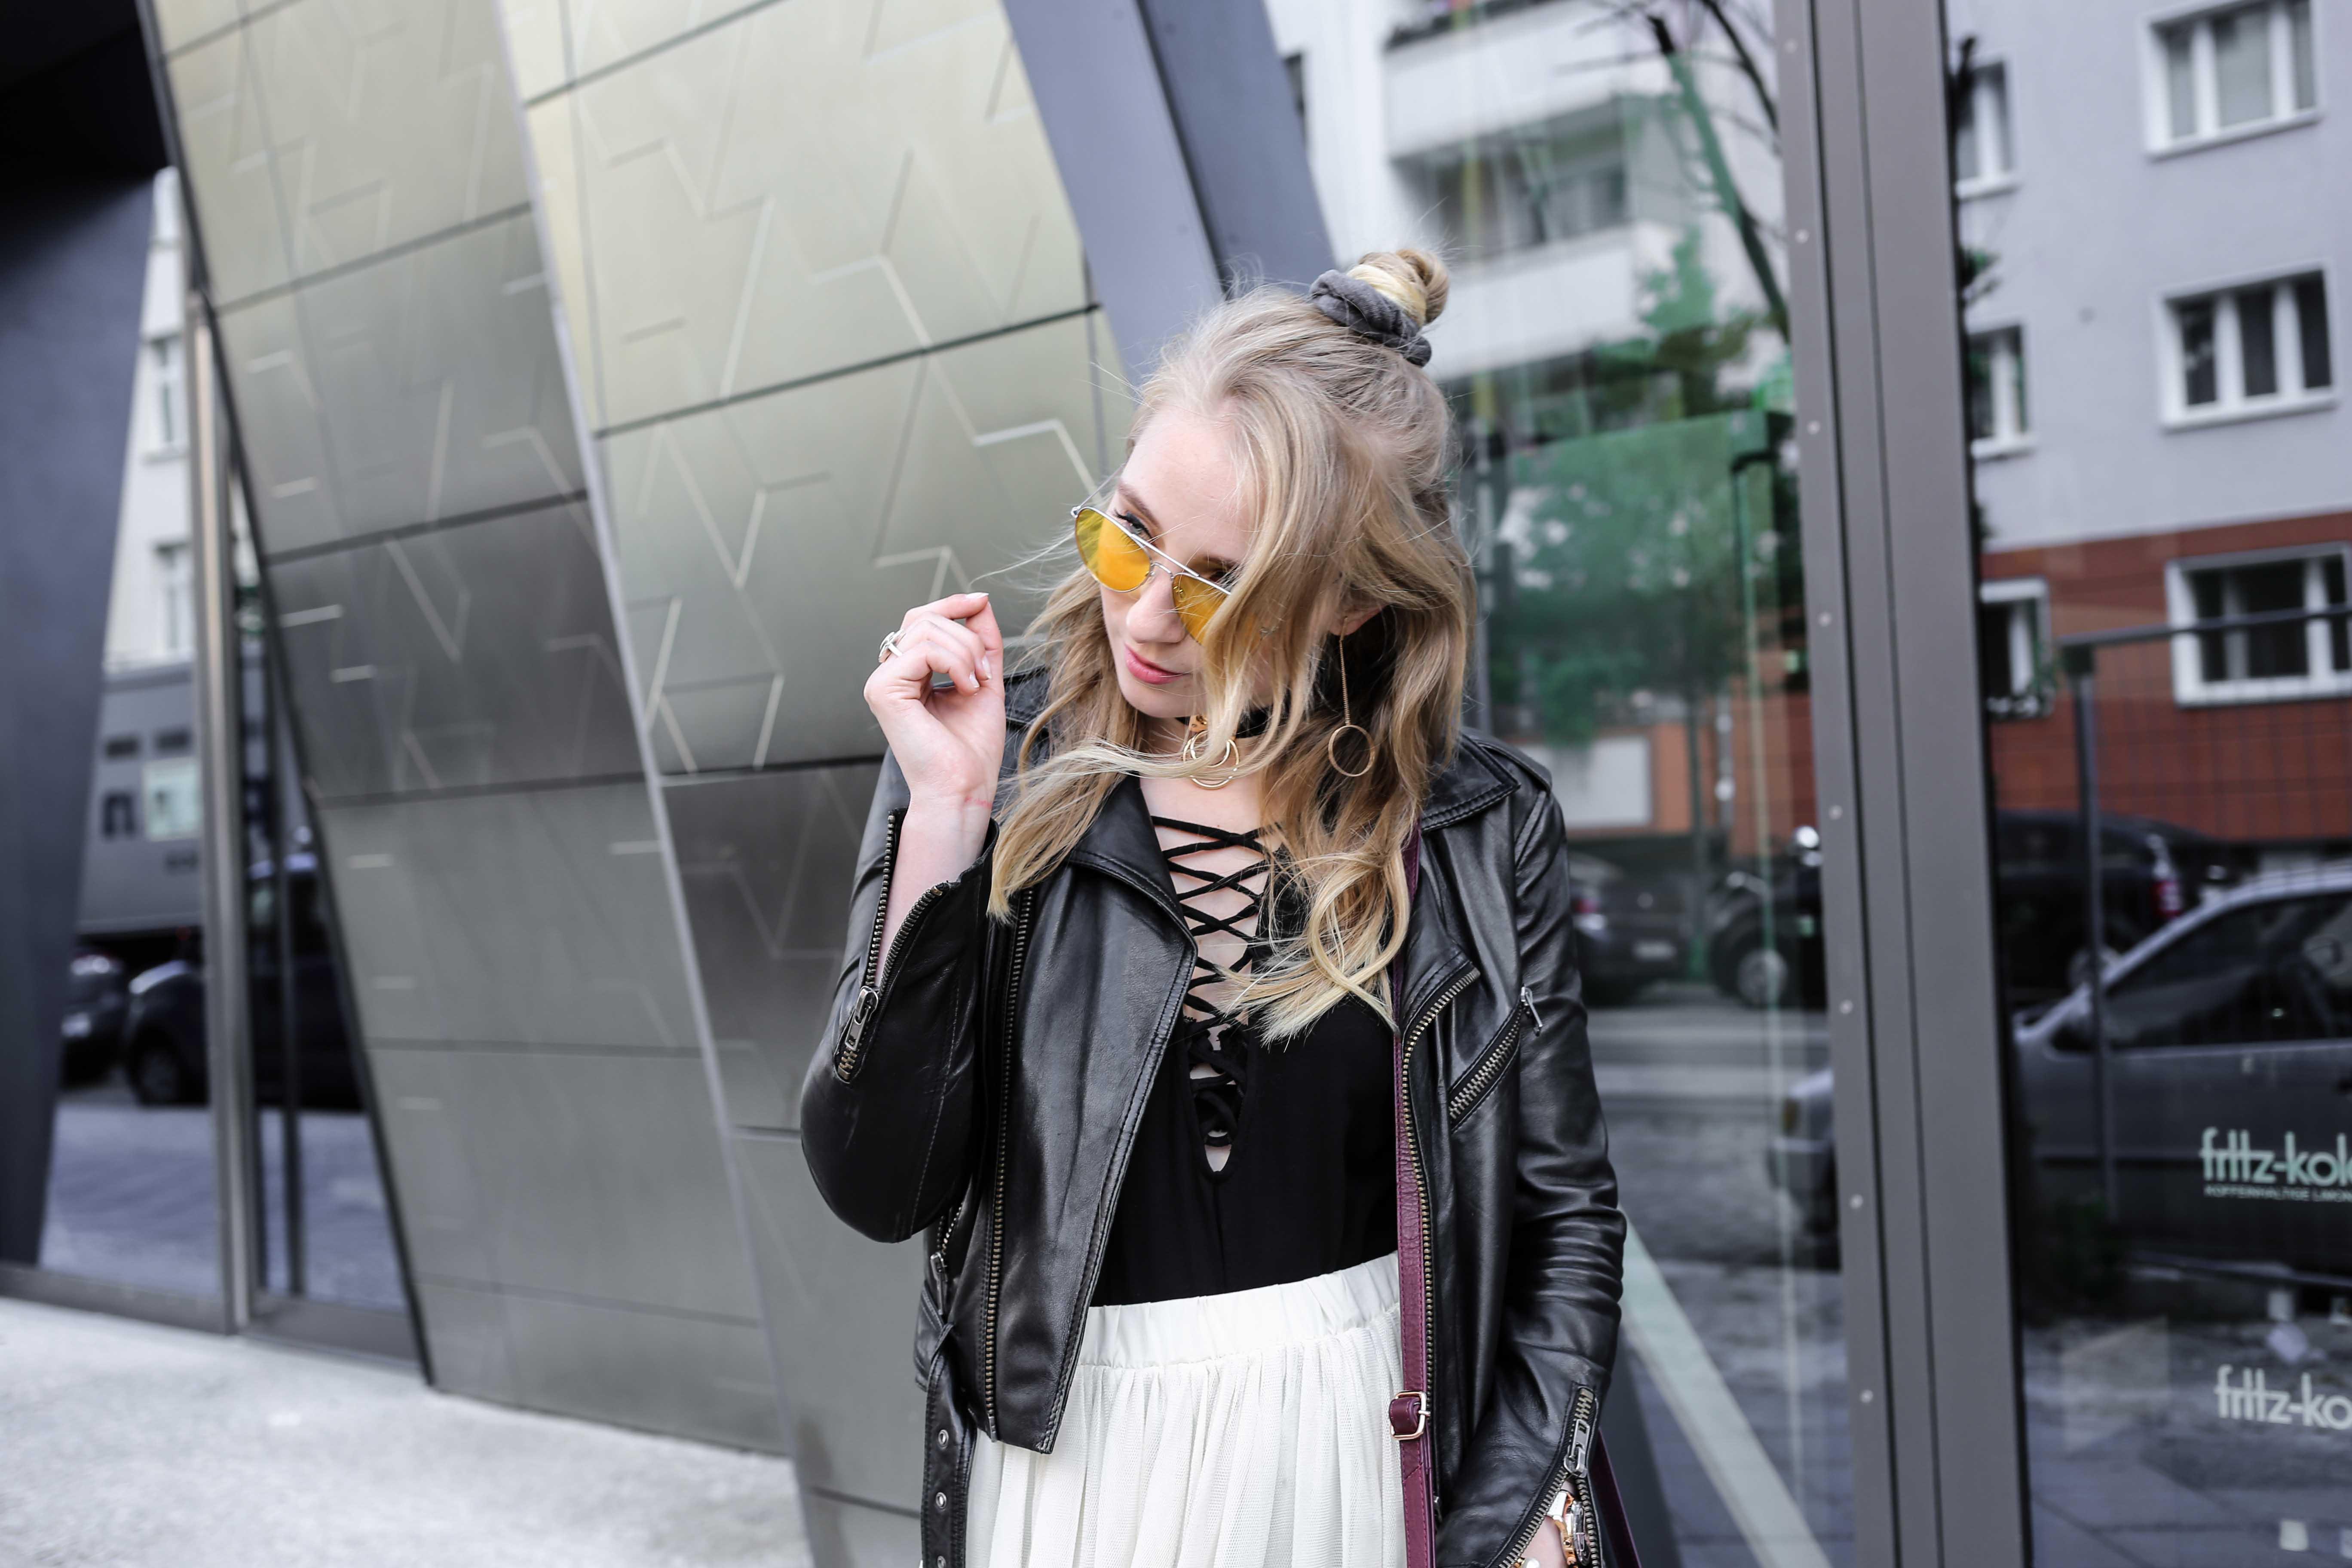 fashion-week-look-schnürbody-plisseerock-retro-sonnenbrille-fashionblog-modeblog-berlin-köln_8812